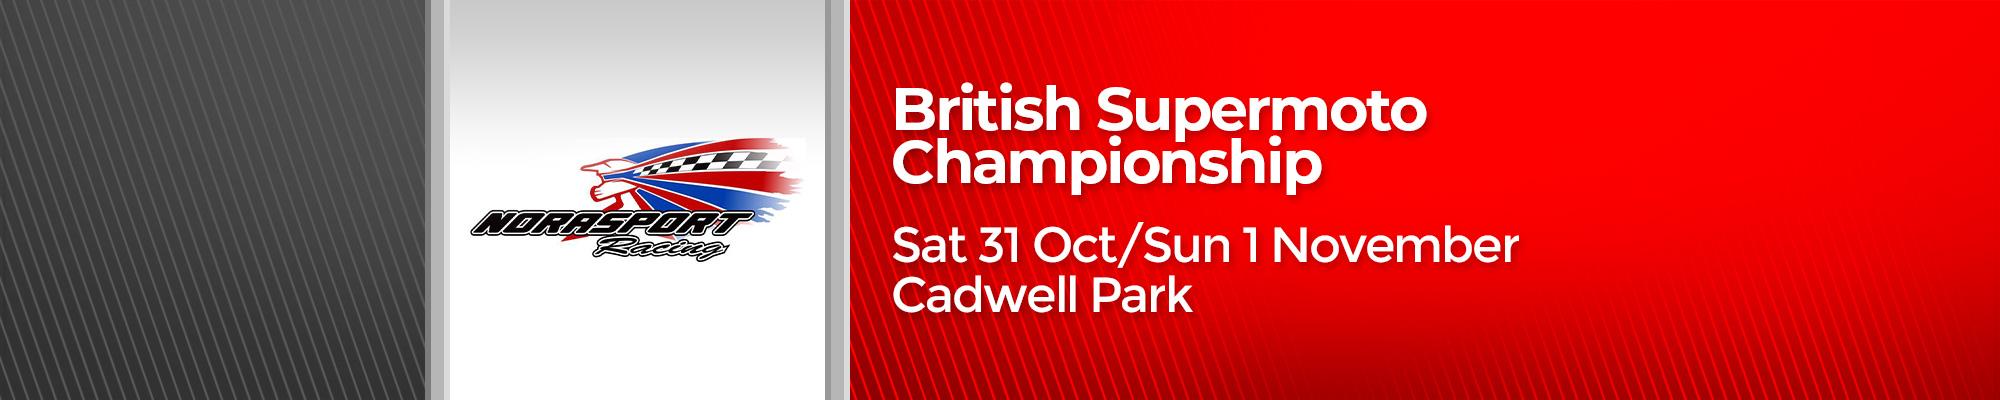 British Supermoto Championship